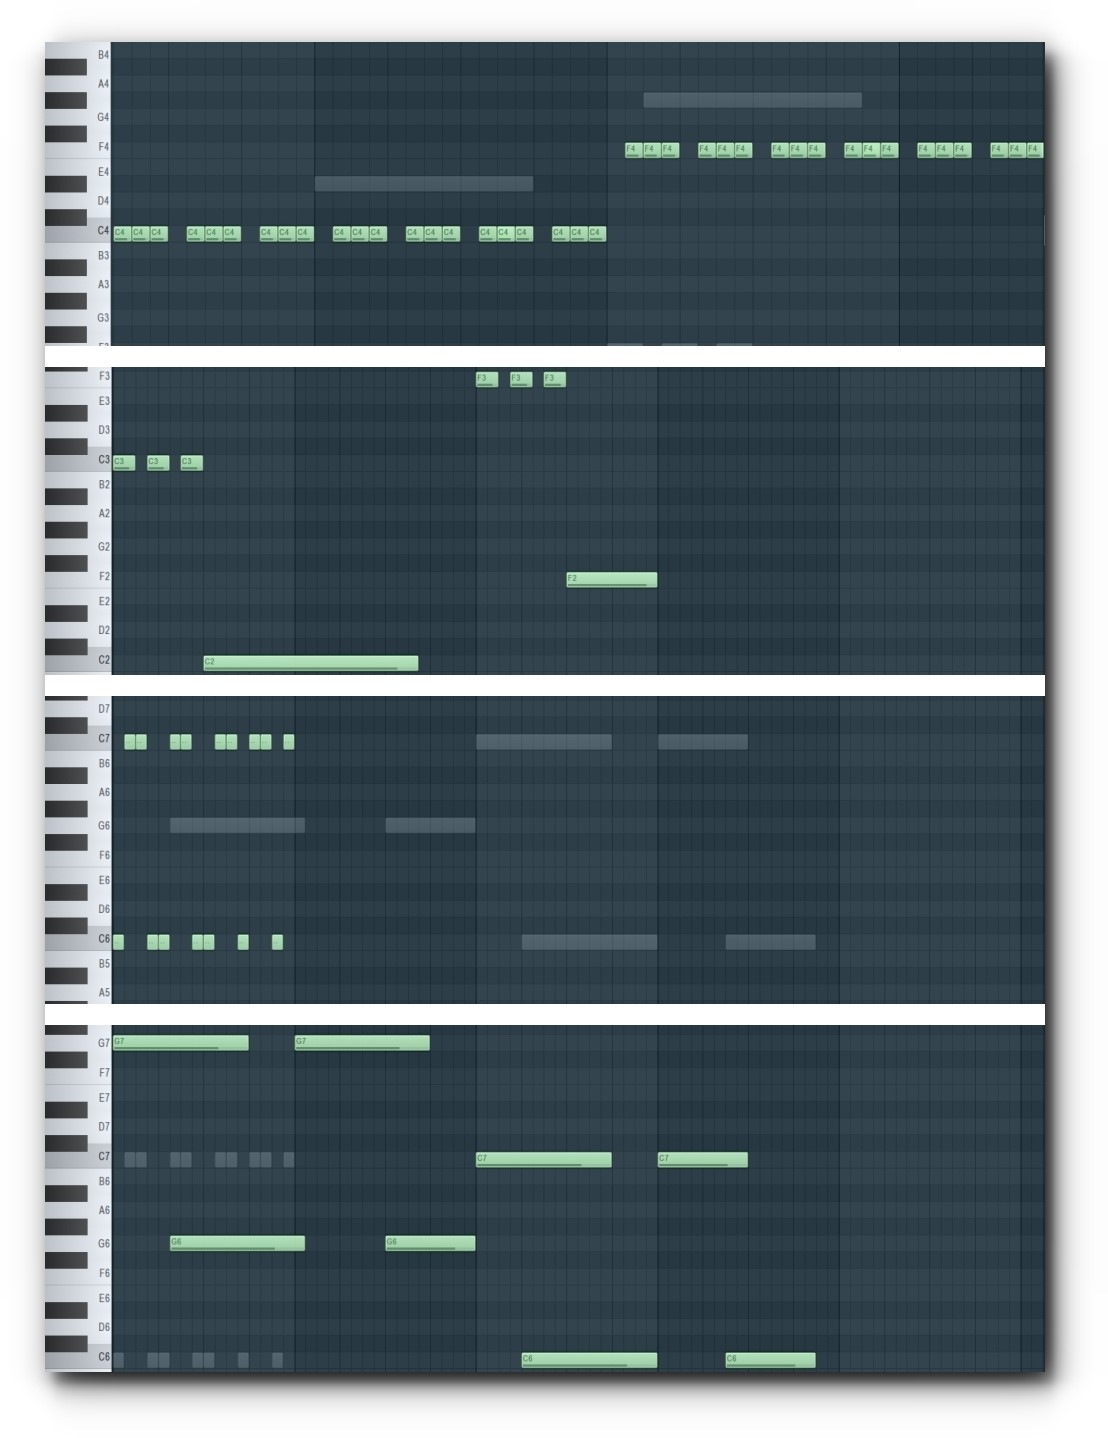 Chords 2